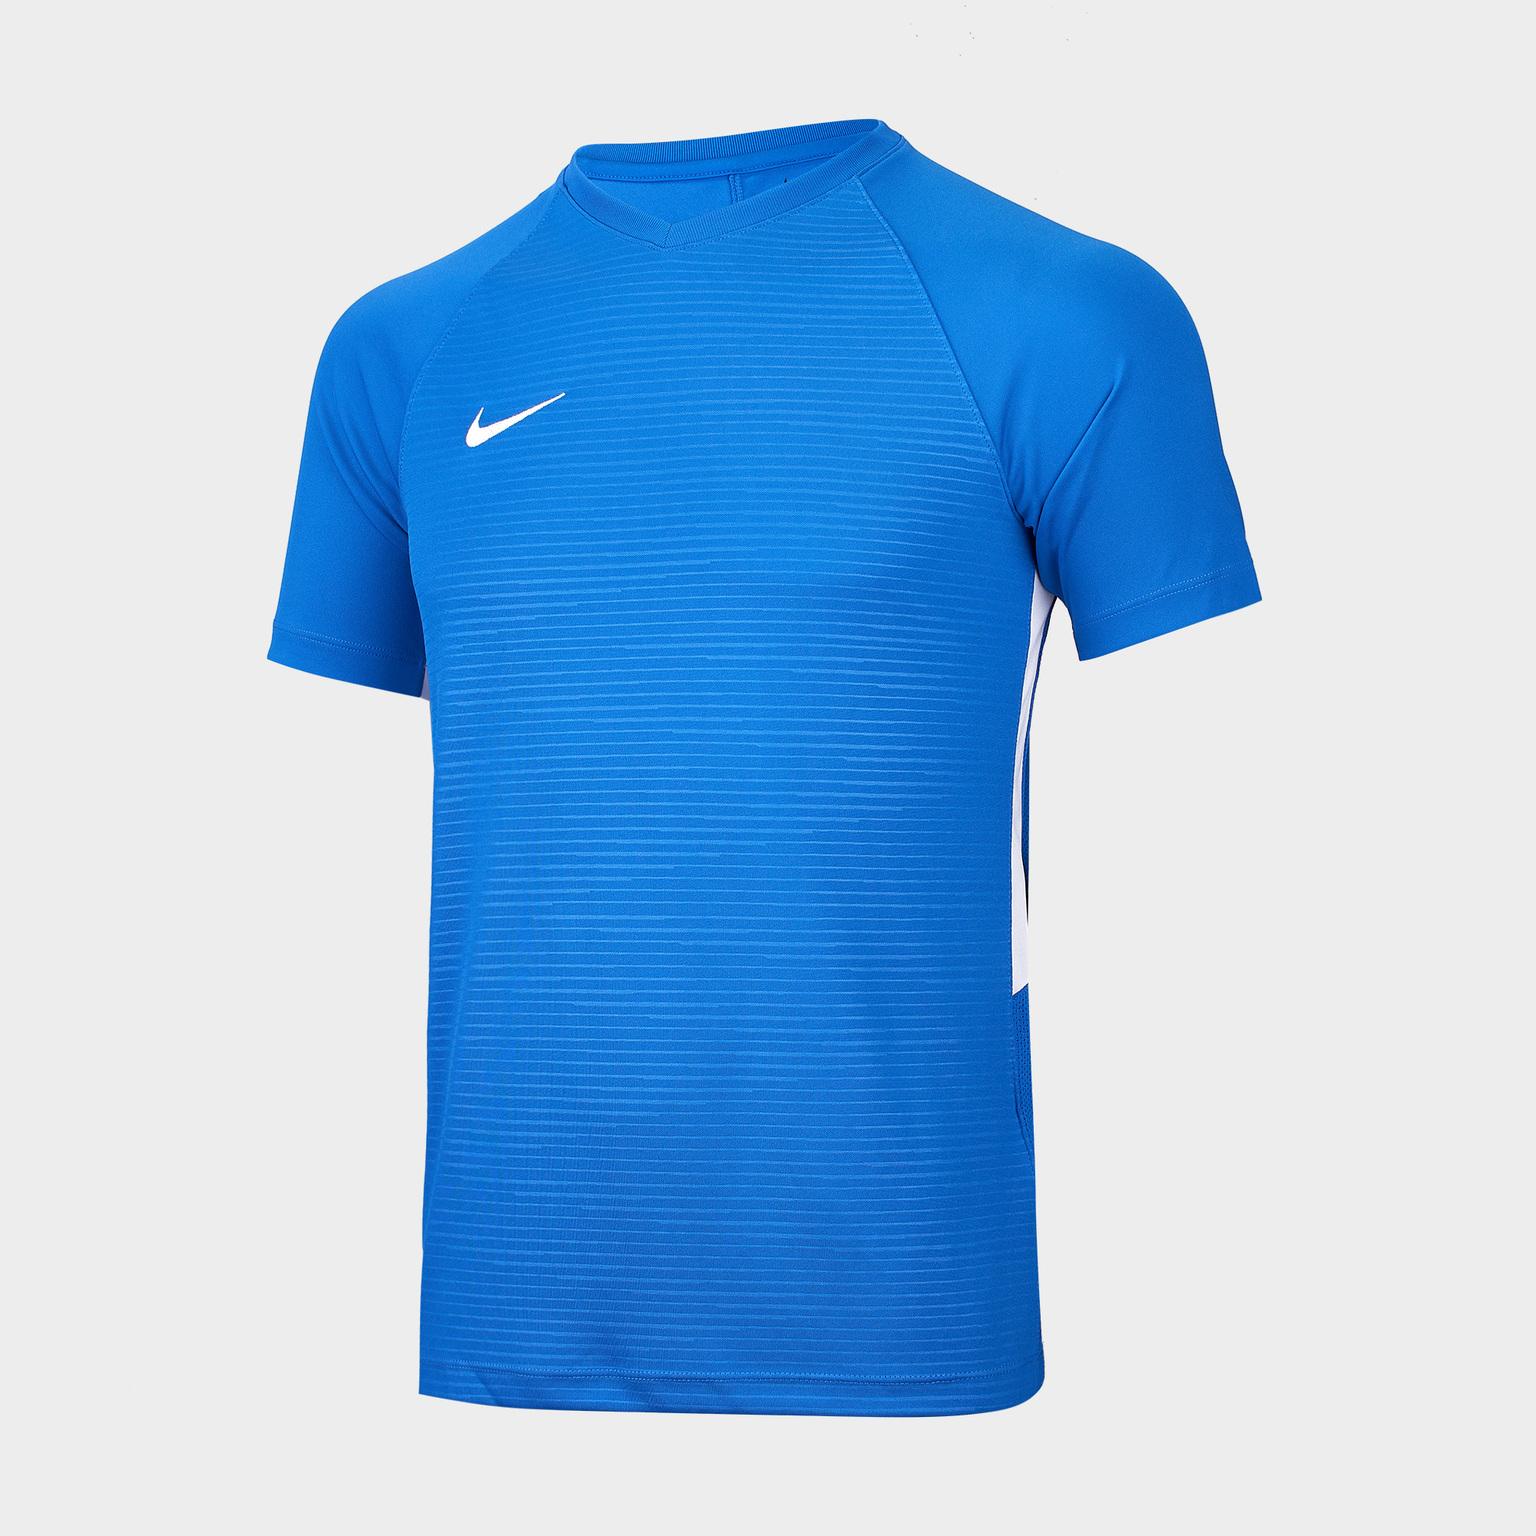 Футболка детская Nike Dry Tiempo Premier 894111-463 tiempo muerto